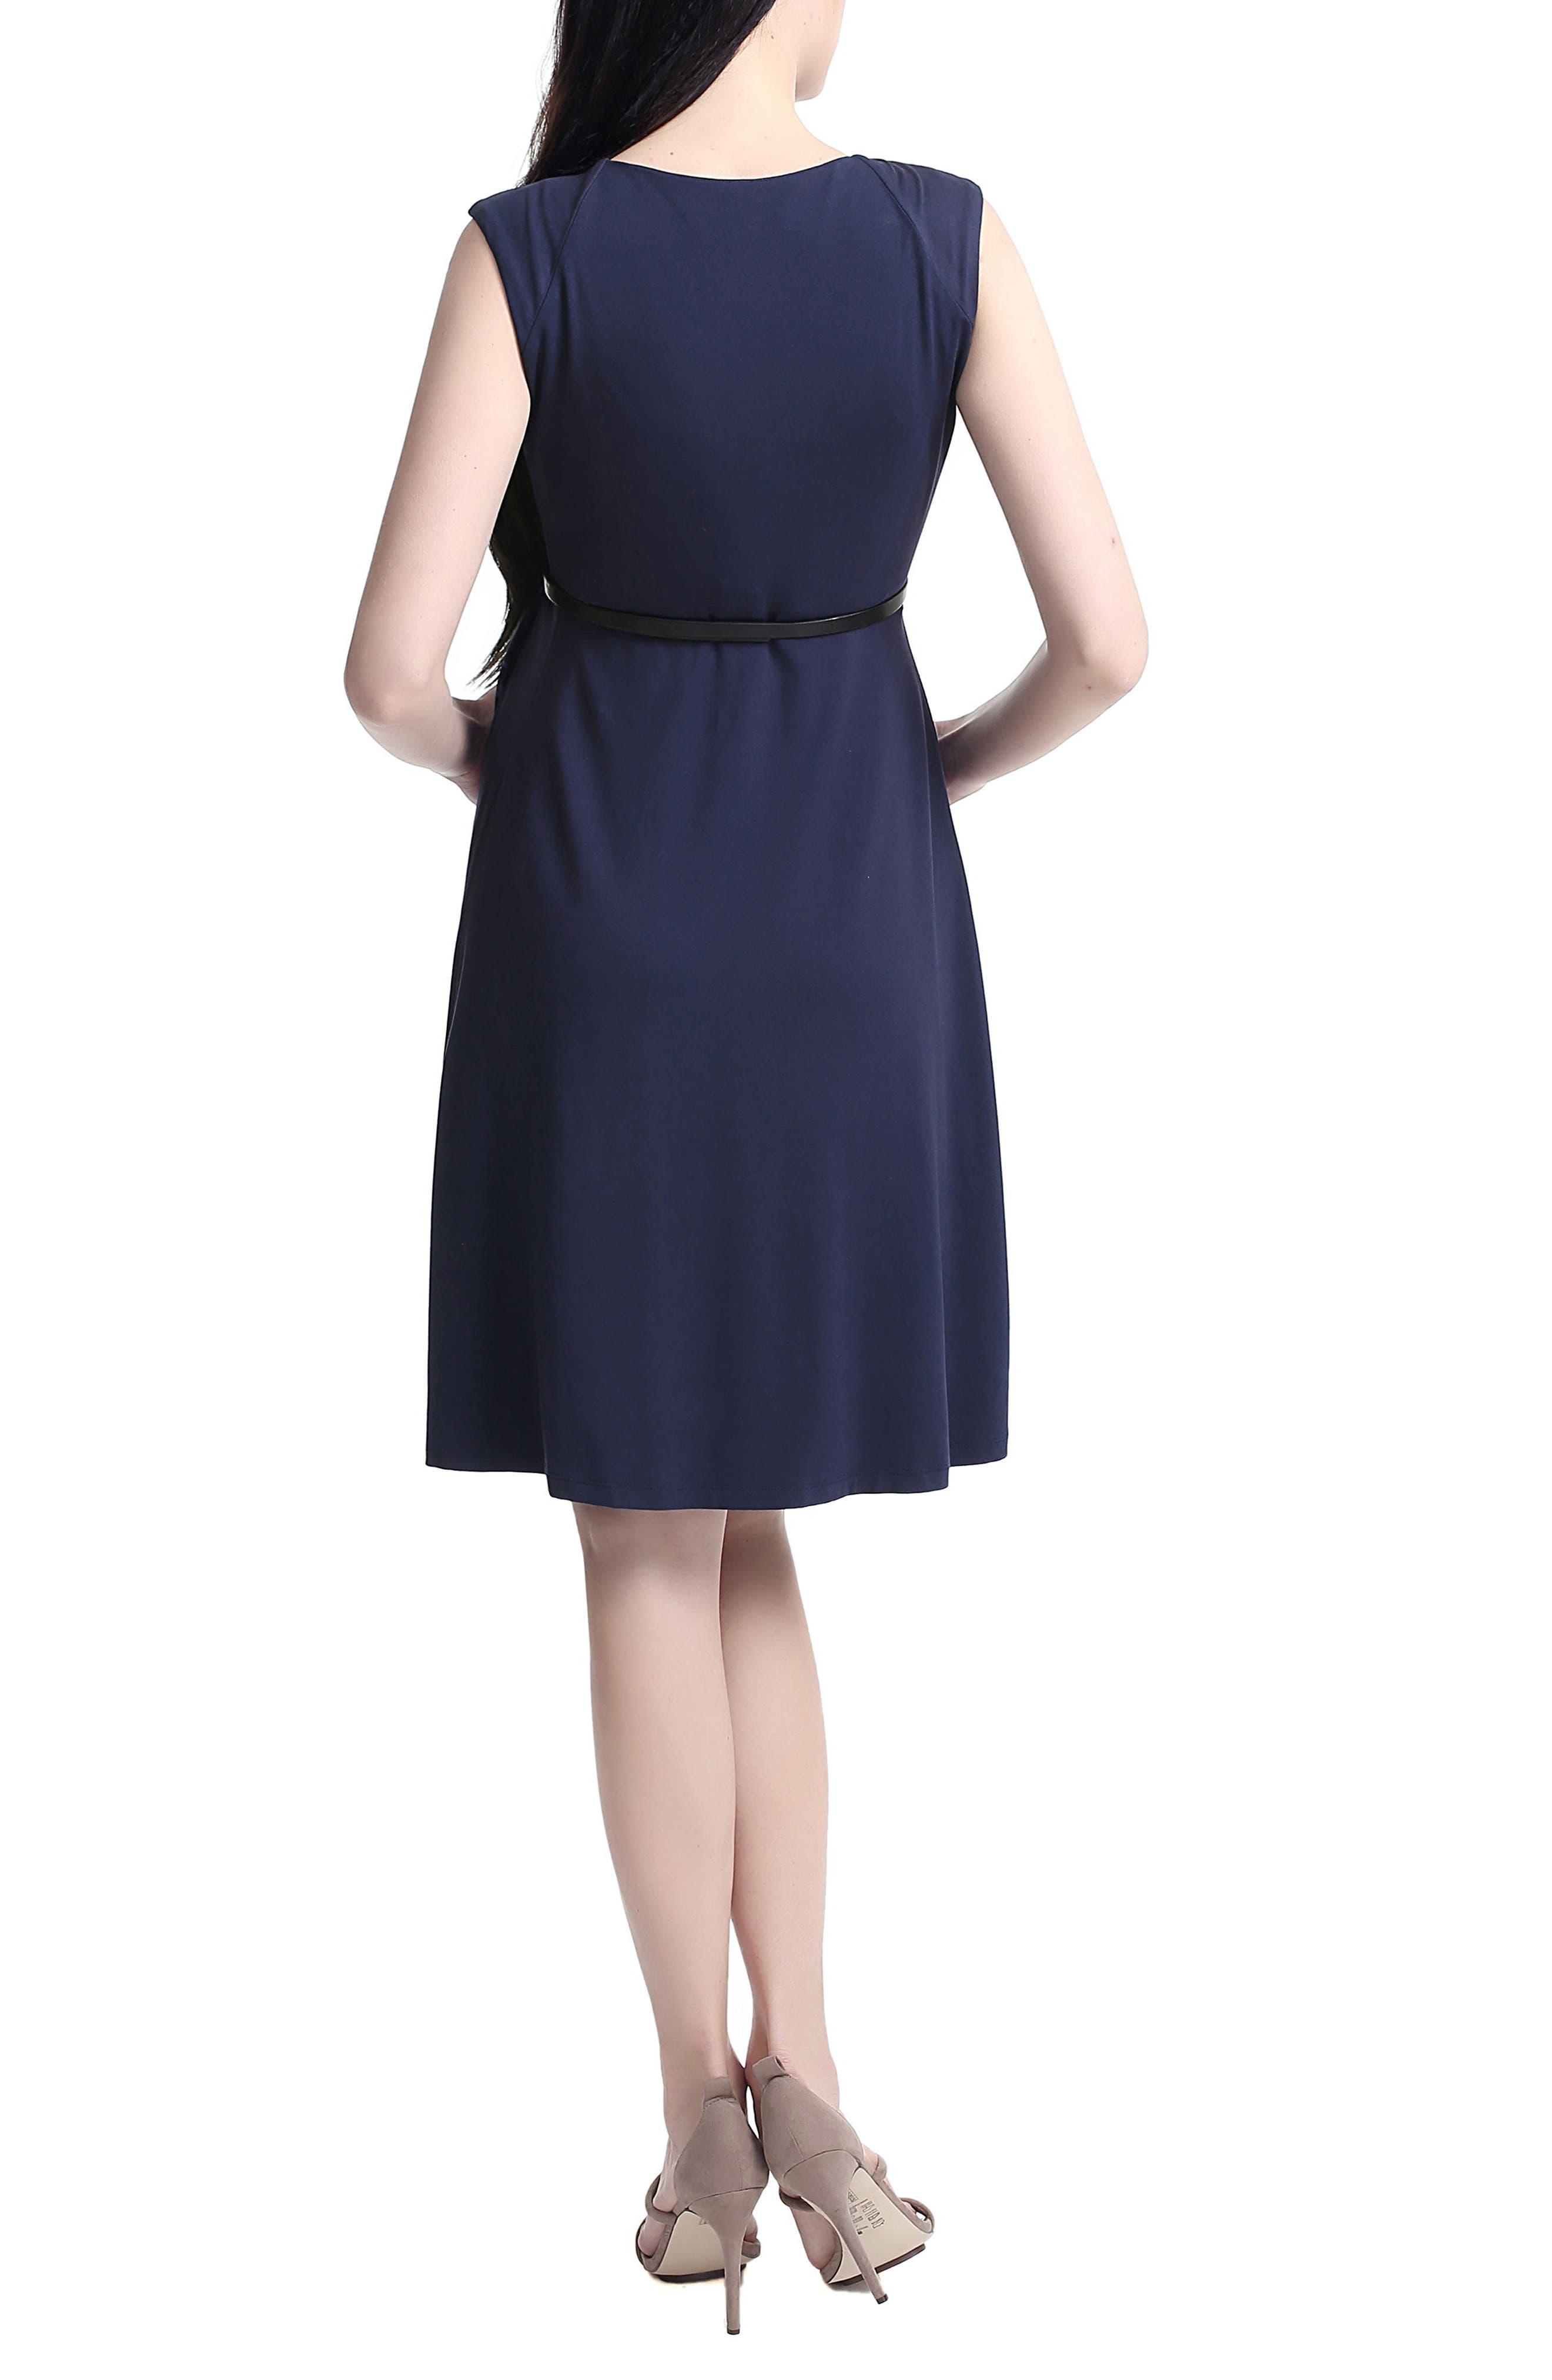 Rana Pleated Maternity/Nursing Dress,                             Alternate thumbnail 2, color,                             Navy